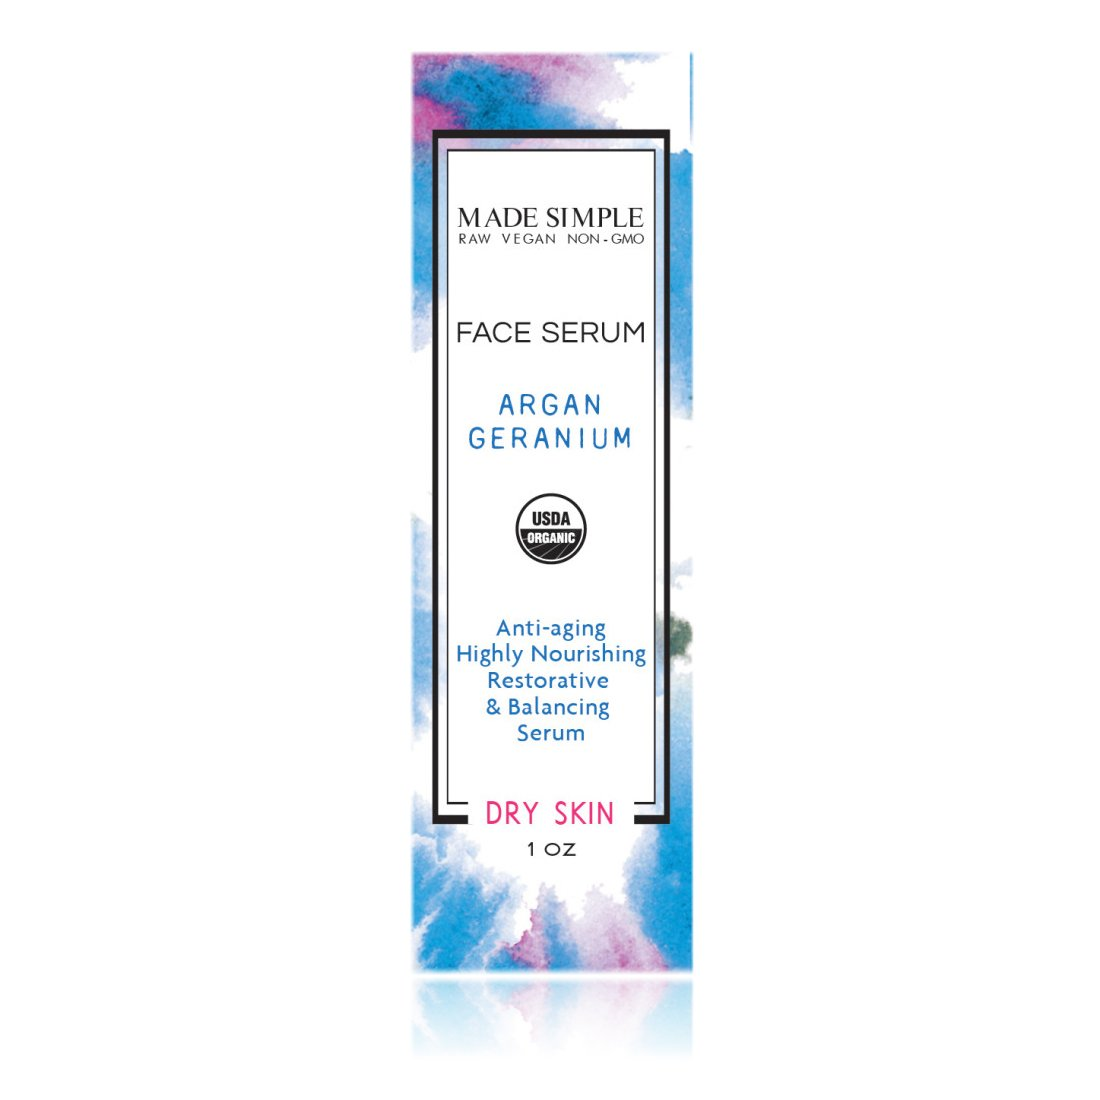 Argan Geranium Face Serum (Certified Organic) by Made Simple Skin Care